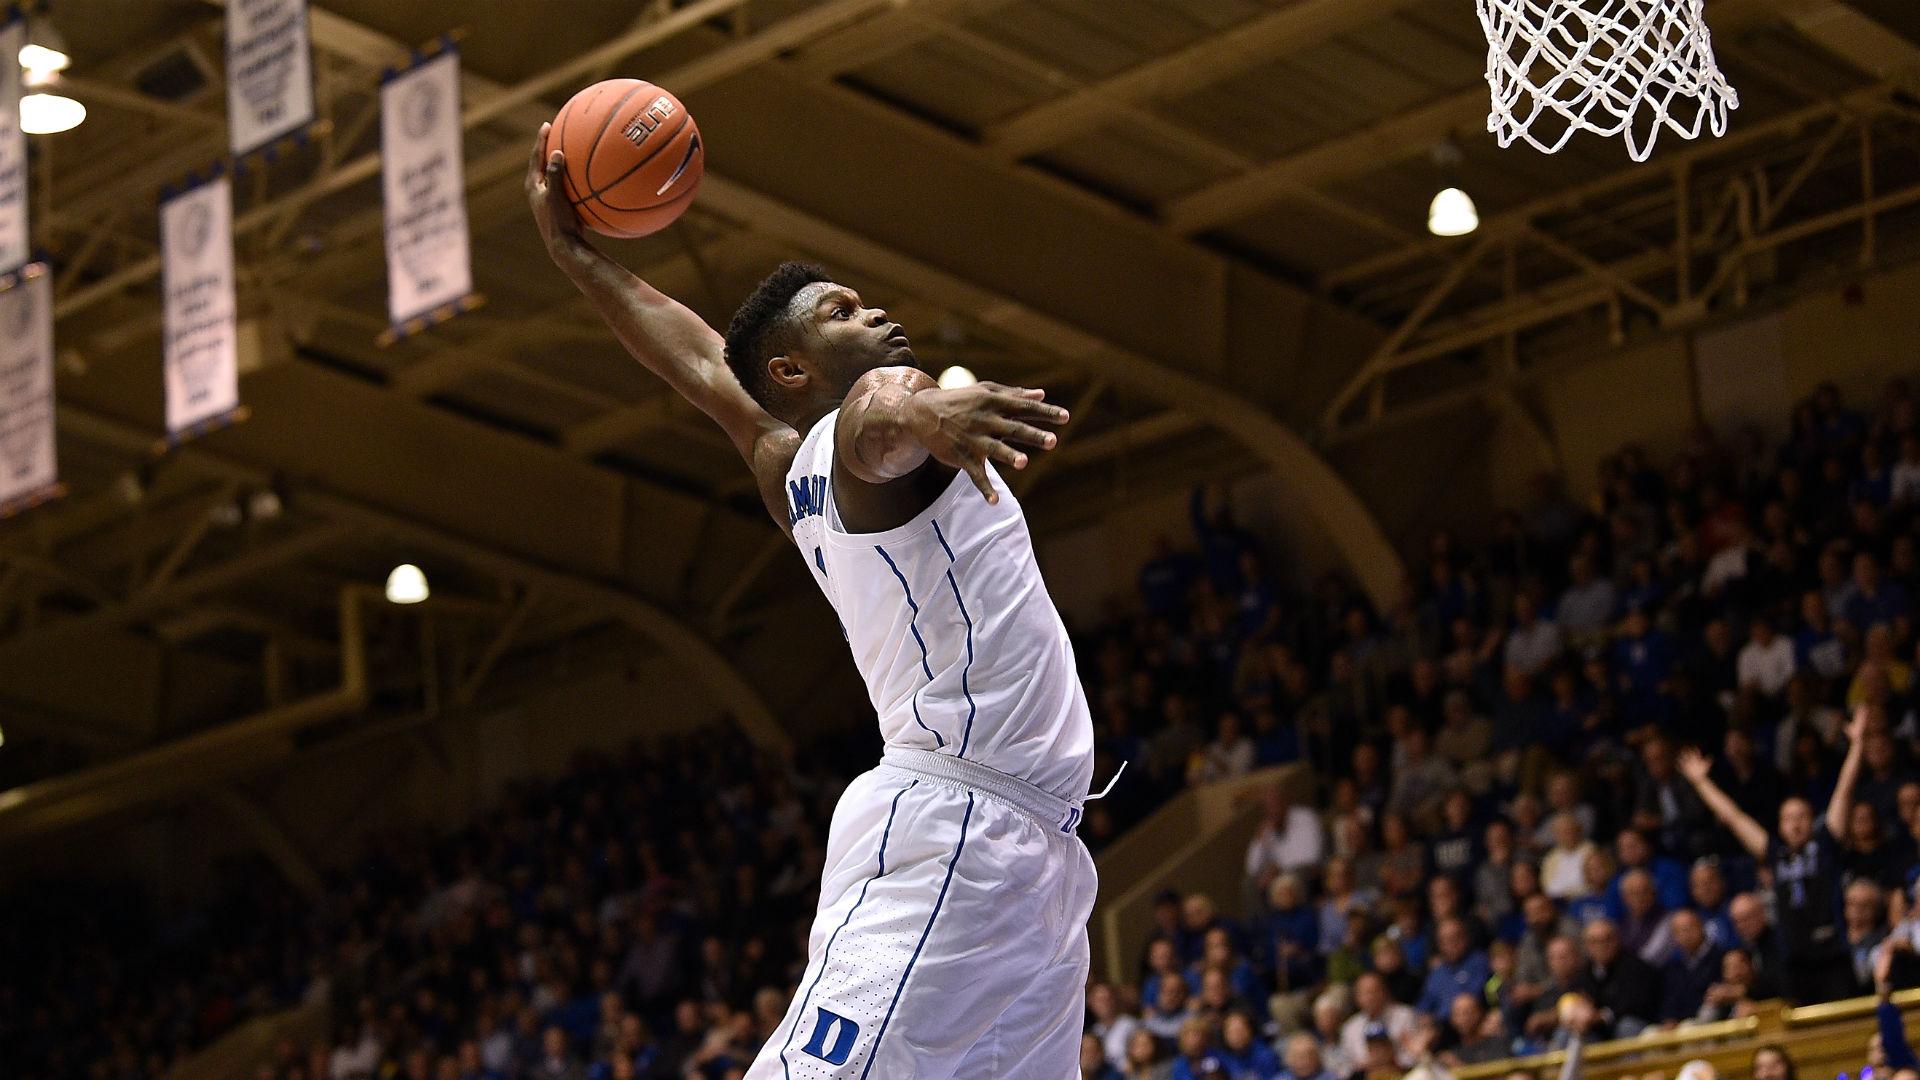 Duke sensation Zion Williamson was offered football scholarship to LSU